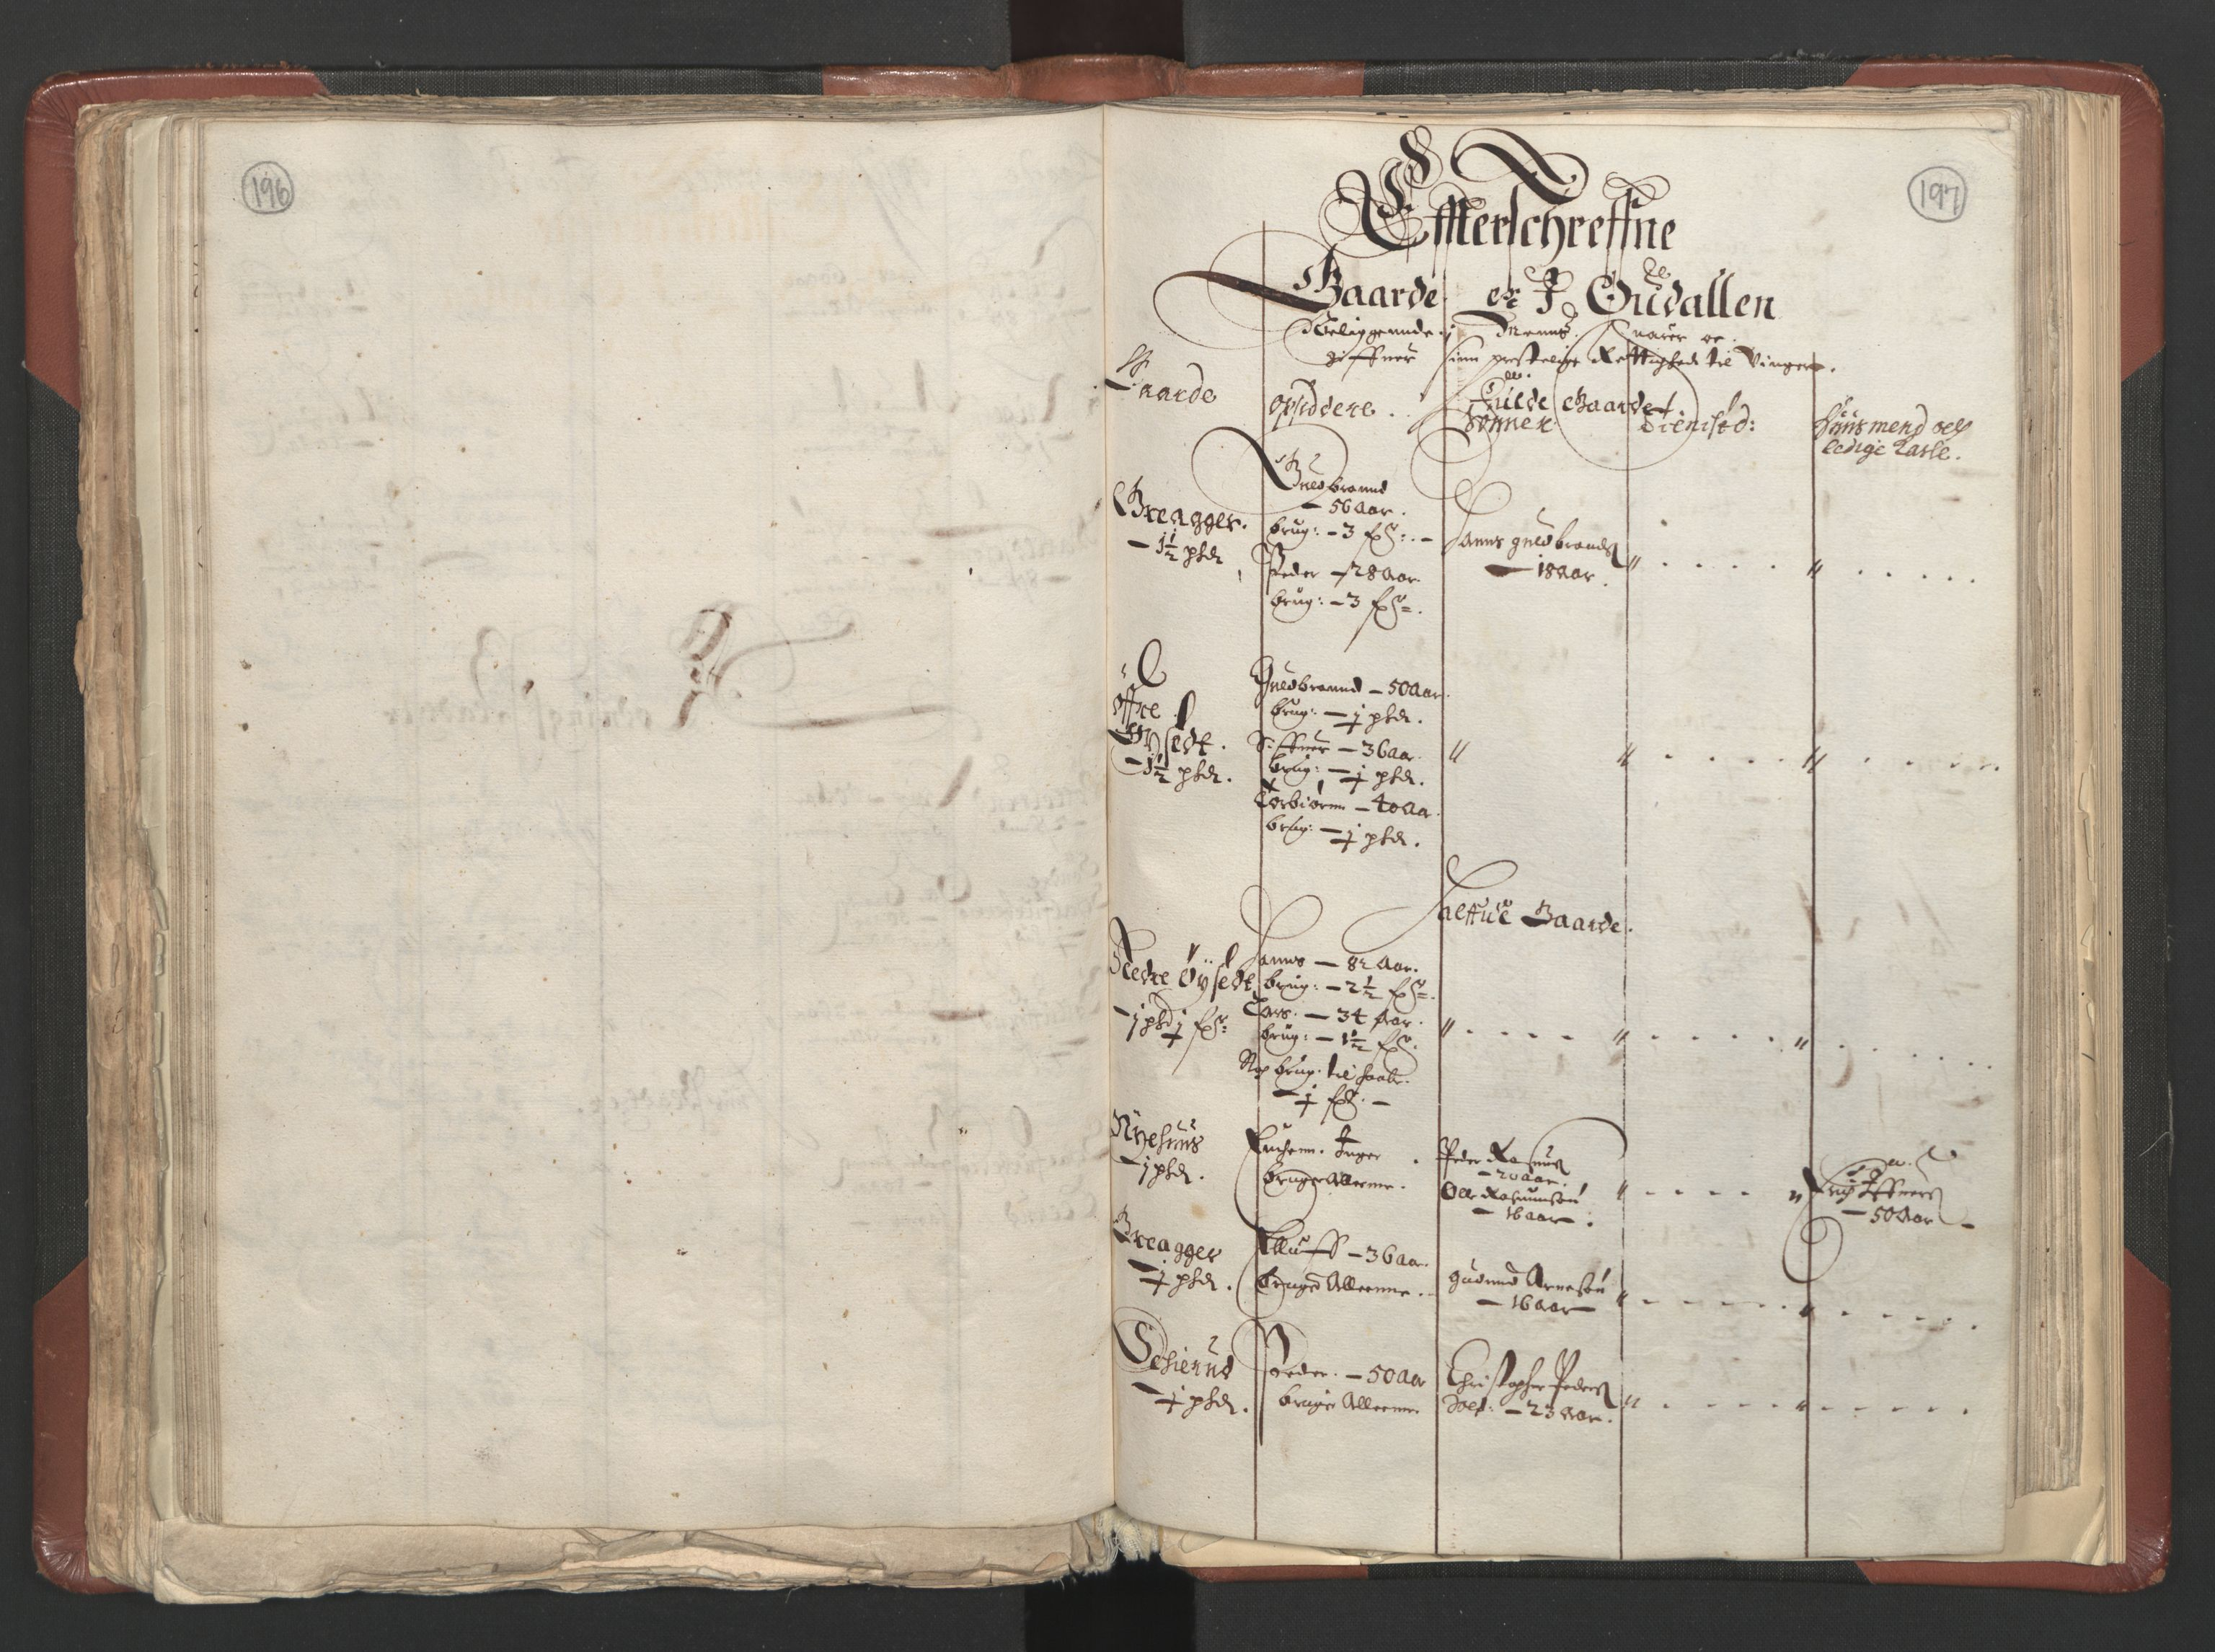 RA, Fogdenes og sorenskrivernes manntall 1664-1666, nr. 3: Hedmark fogderi og Solør, Østerdal og Odal fogderi, 1664, s. 196-197